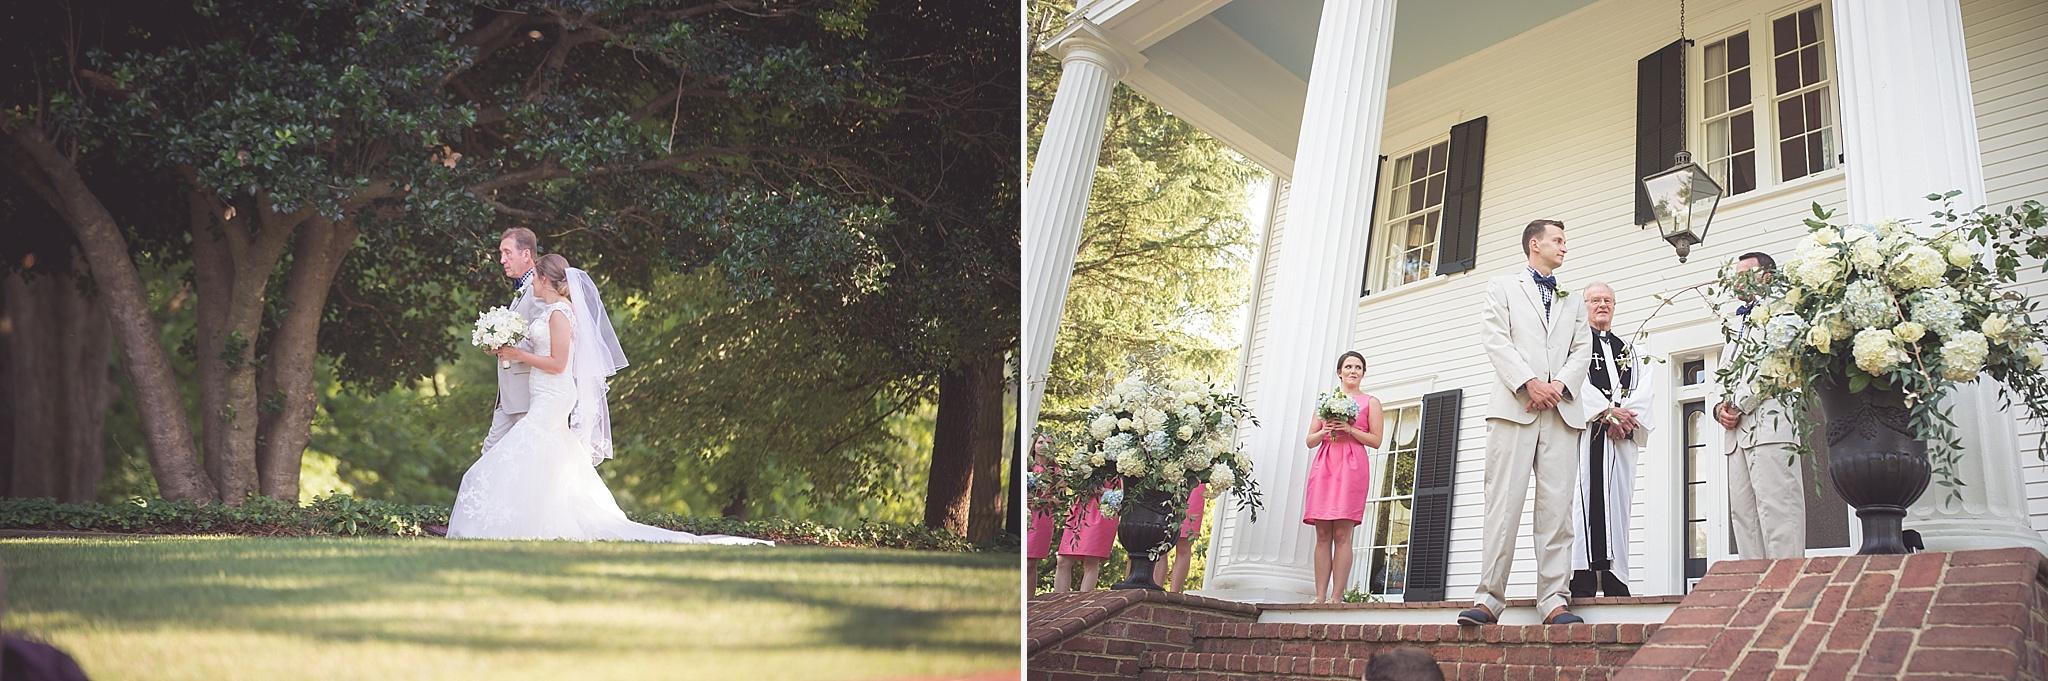 Rose-Hill-Plantation-Photographer-0771.jpg